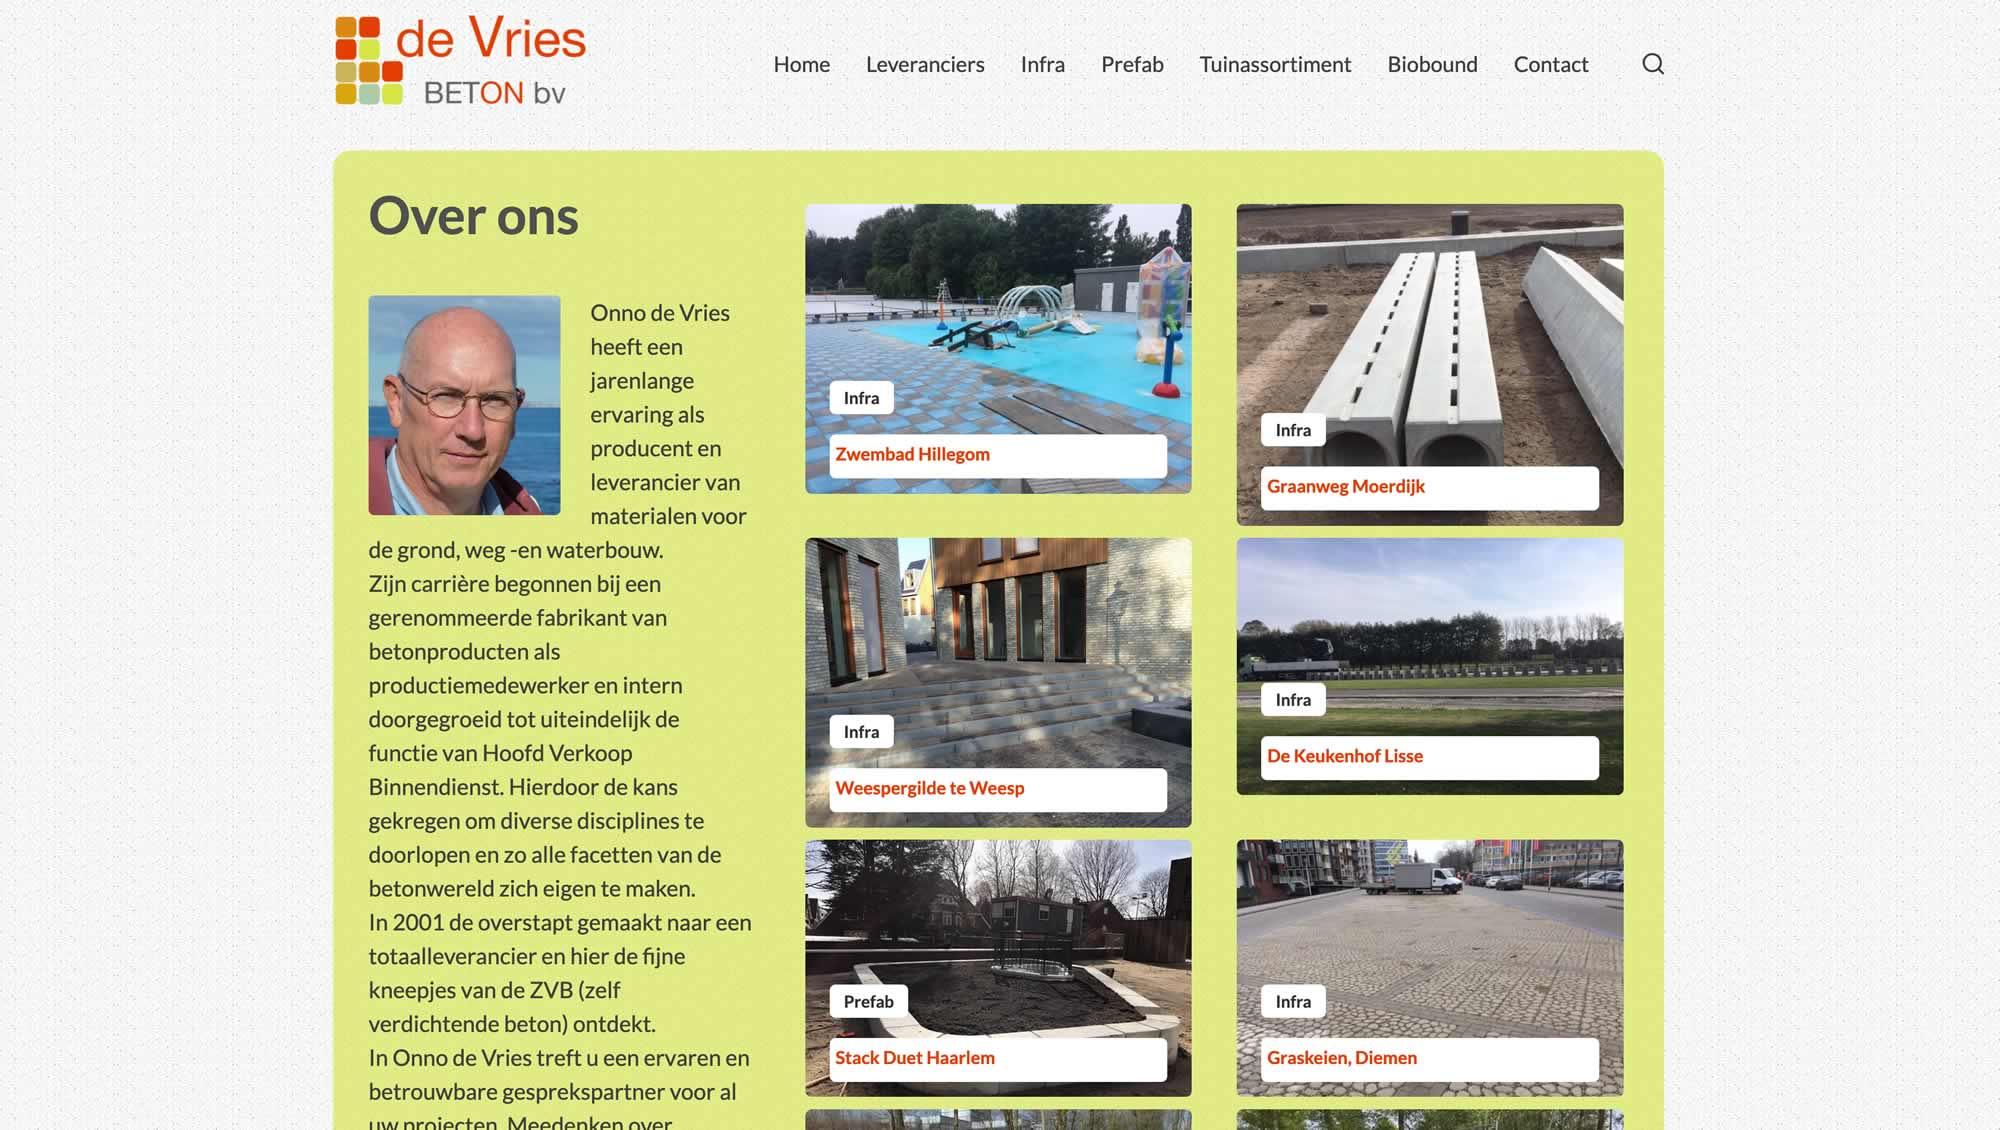 De Vries Beton